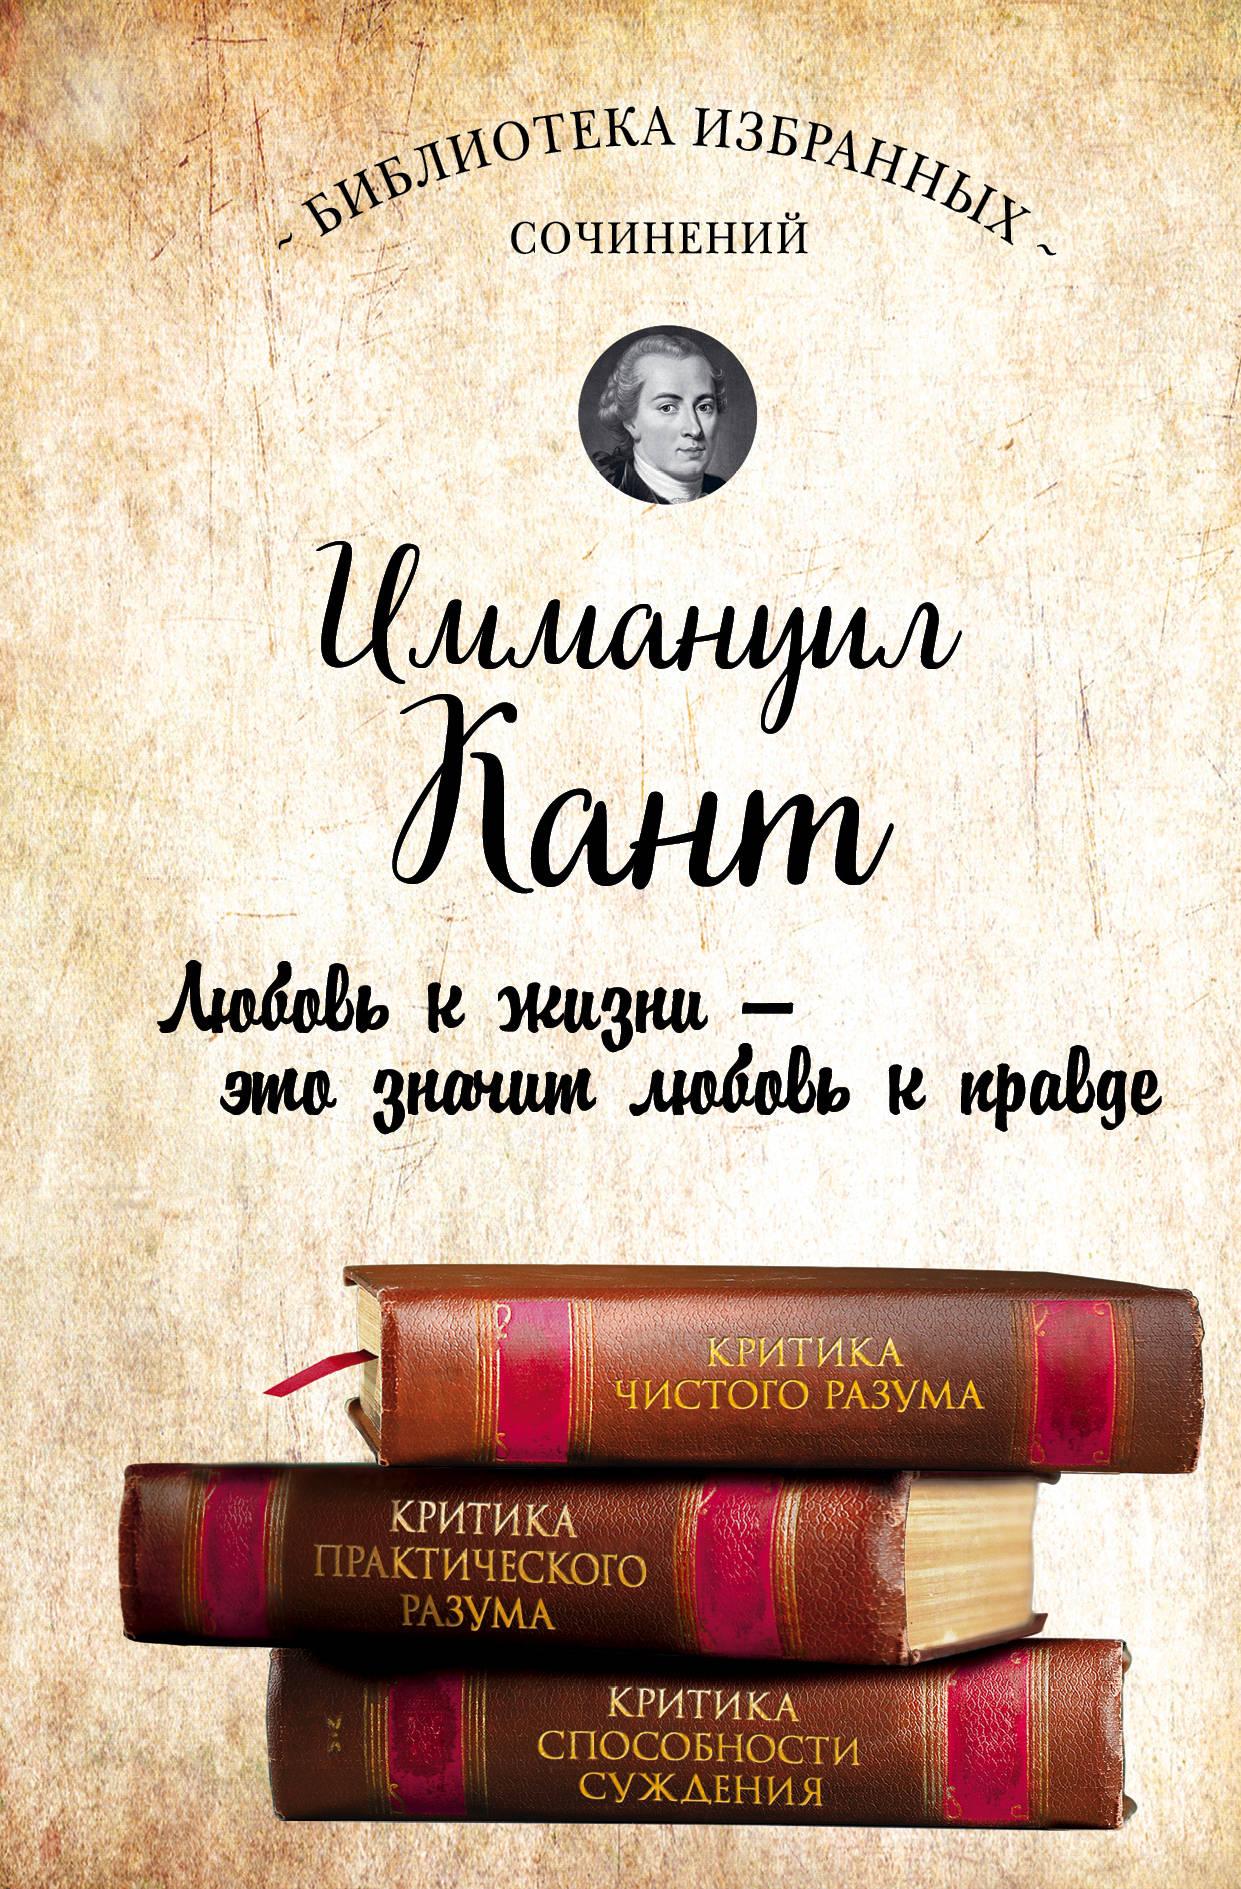 Иммануил Кант Критика чистого разума. Критика практического разума. Критика способности суждения